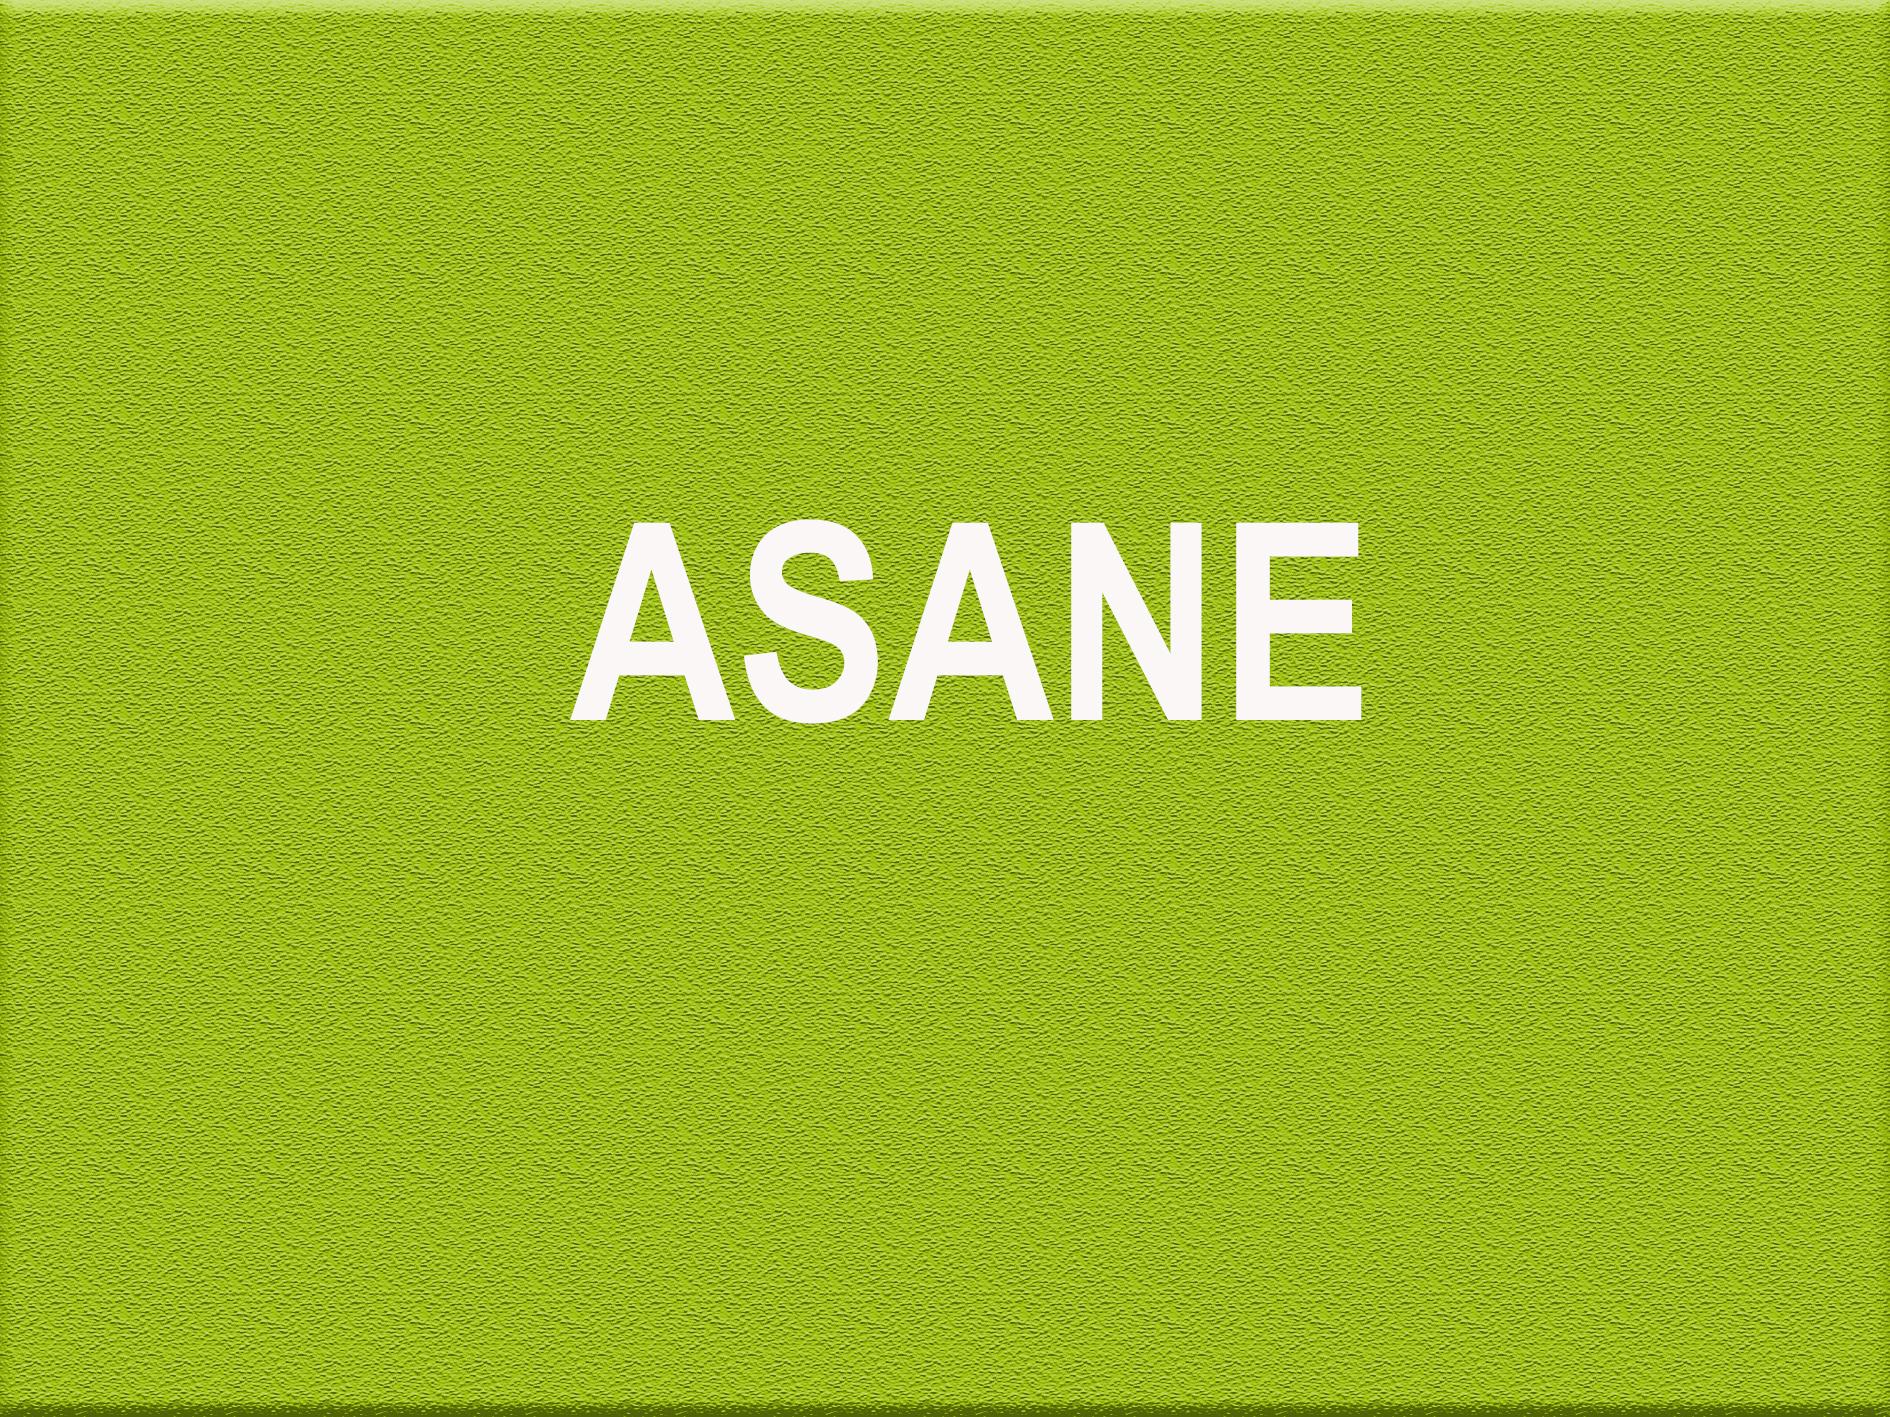 ASANE